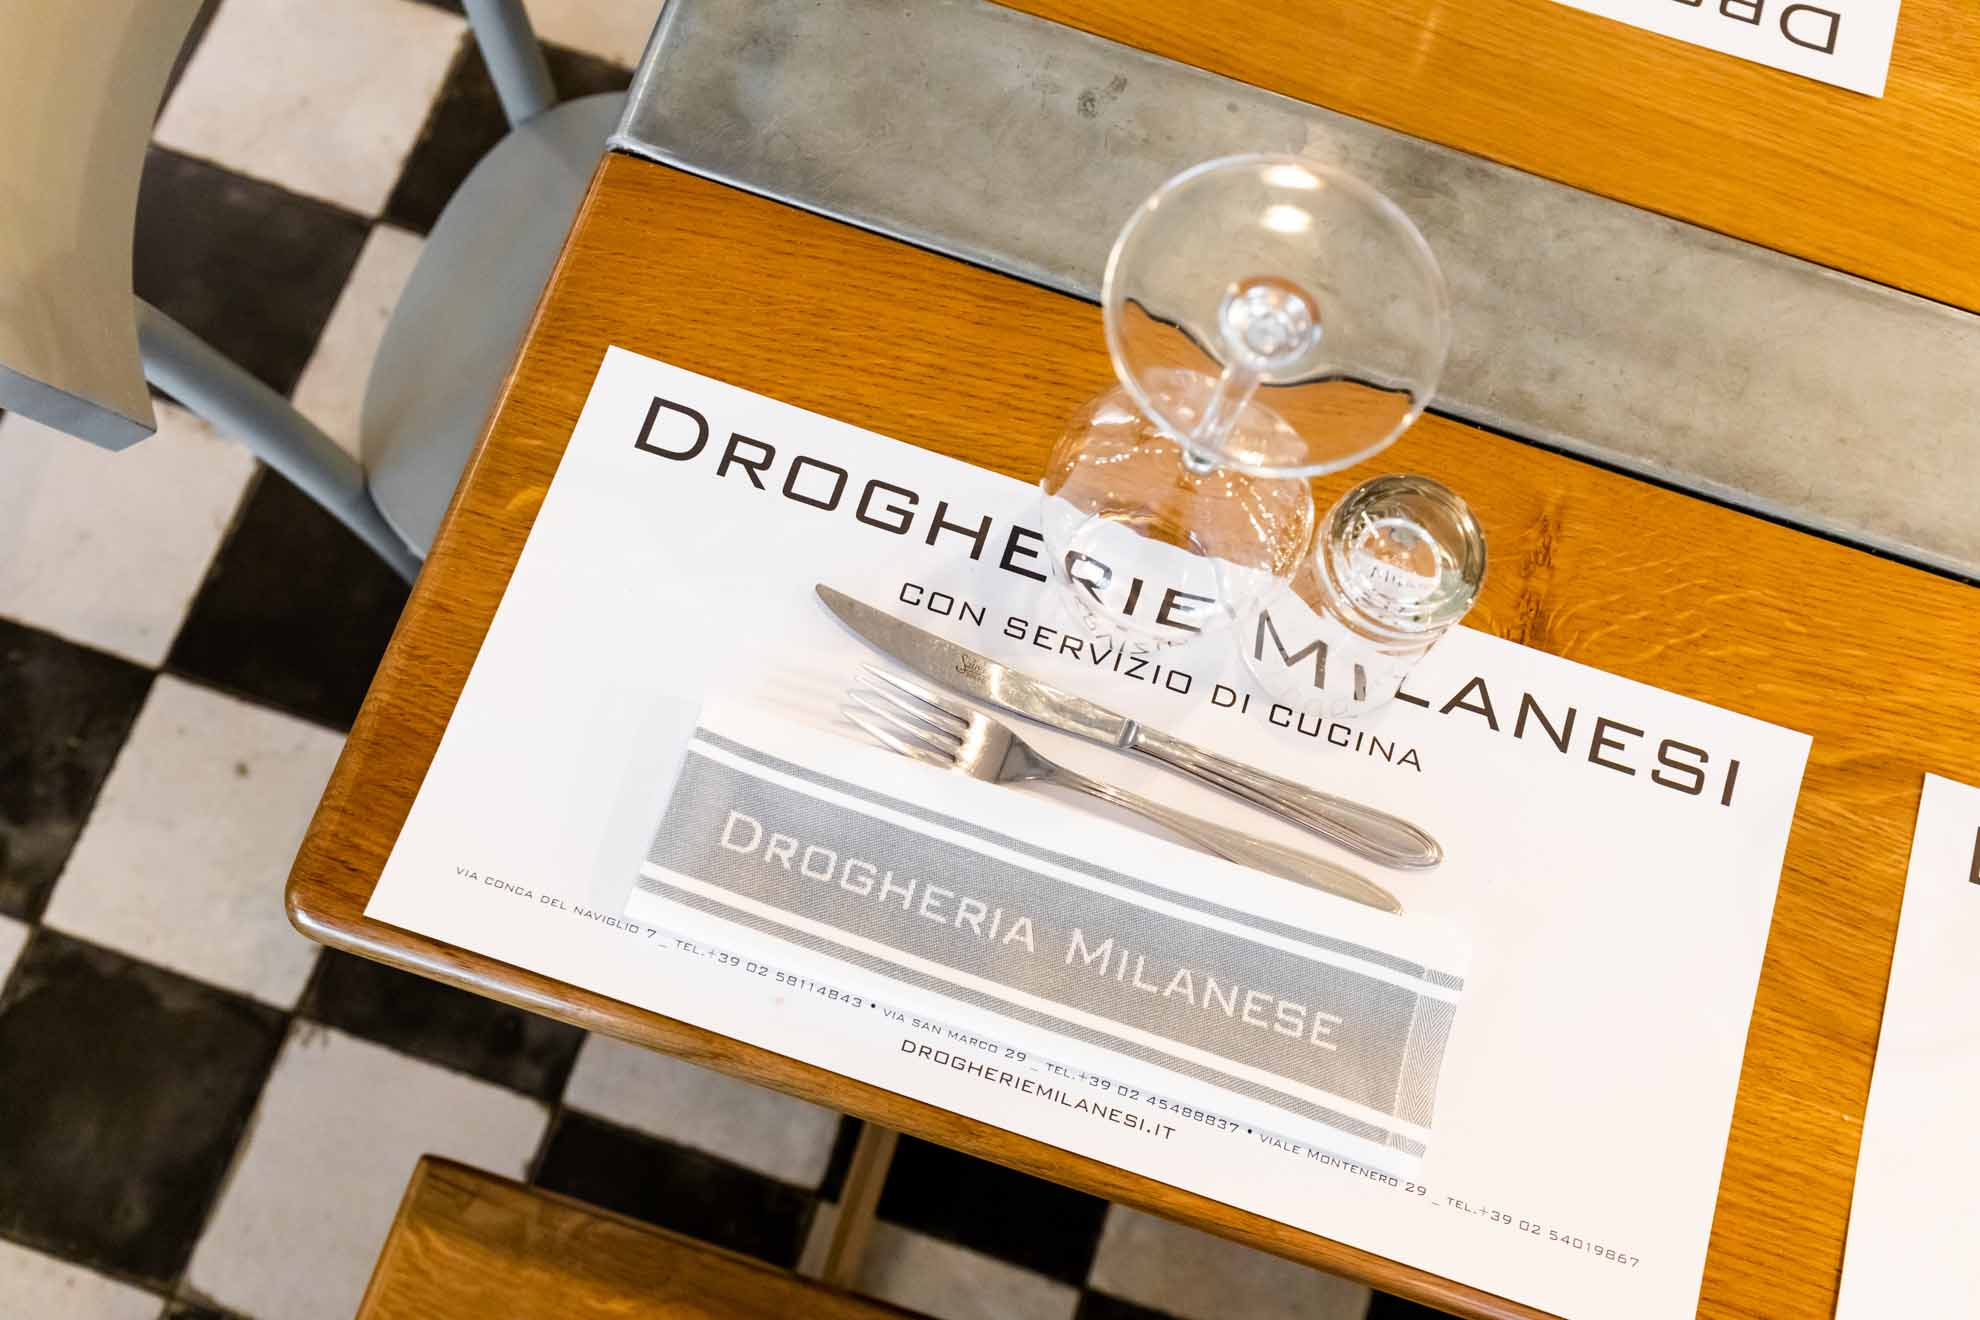 Drogheria Milanese – Monte nero